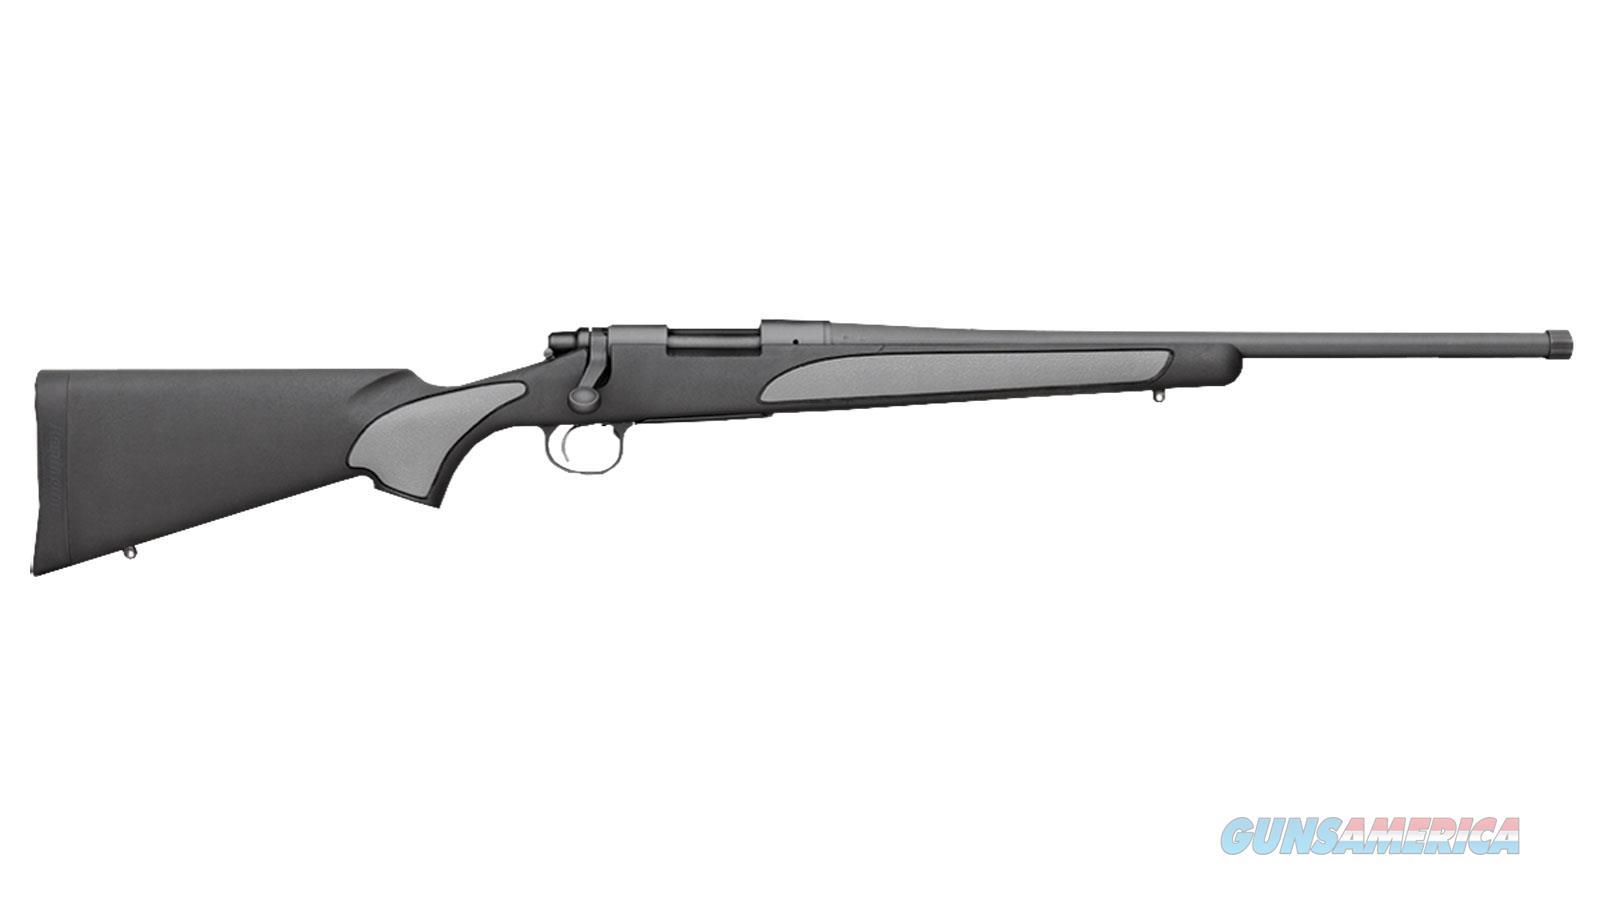 Remington 700 Sps Bolt Action Rifle 308 Win, Rh, 20 In, Matte Black, Syn Stk, 4+1 Rnd, X-Mark Pro Trgr 84159  Guns > Rifles > R Misc Rifles